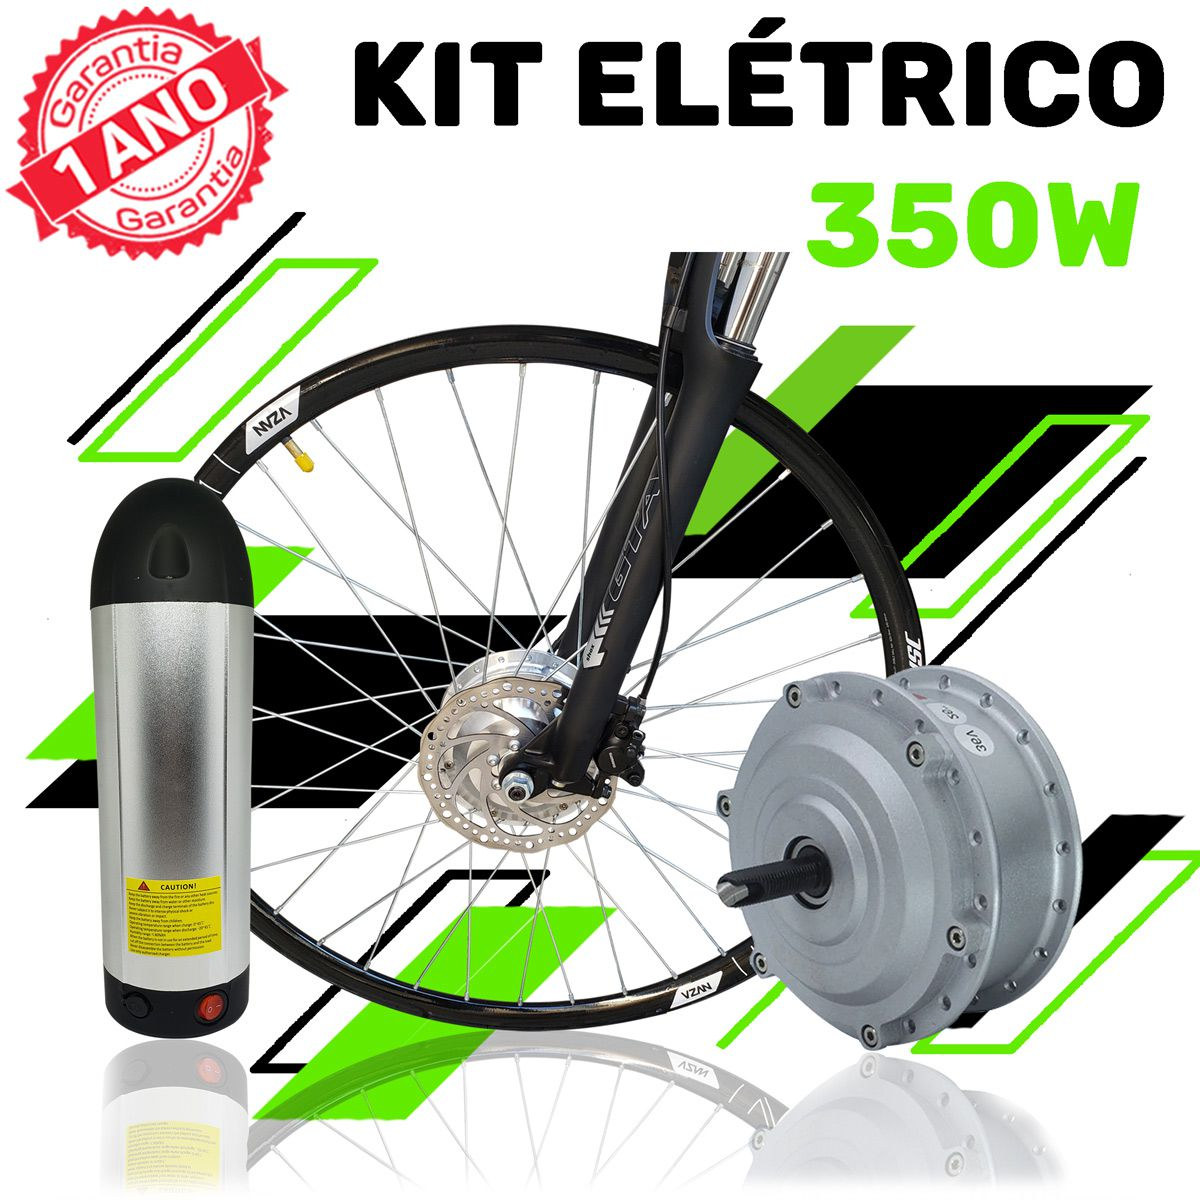 Kit Elétrico TecBike Cilindrico - ARO 29